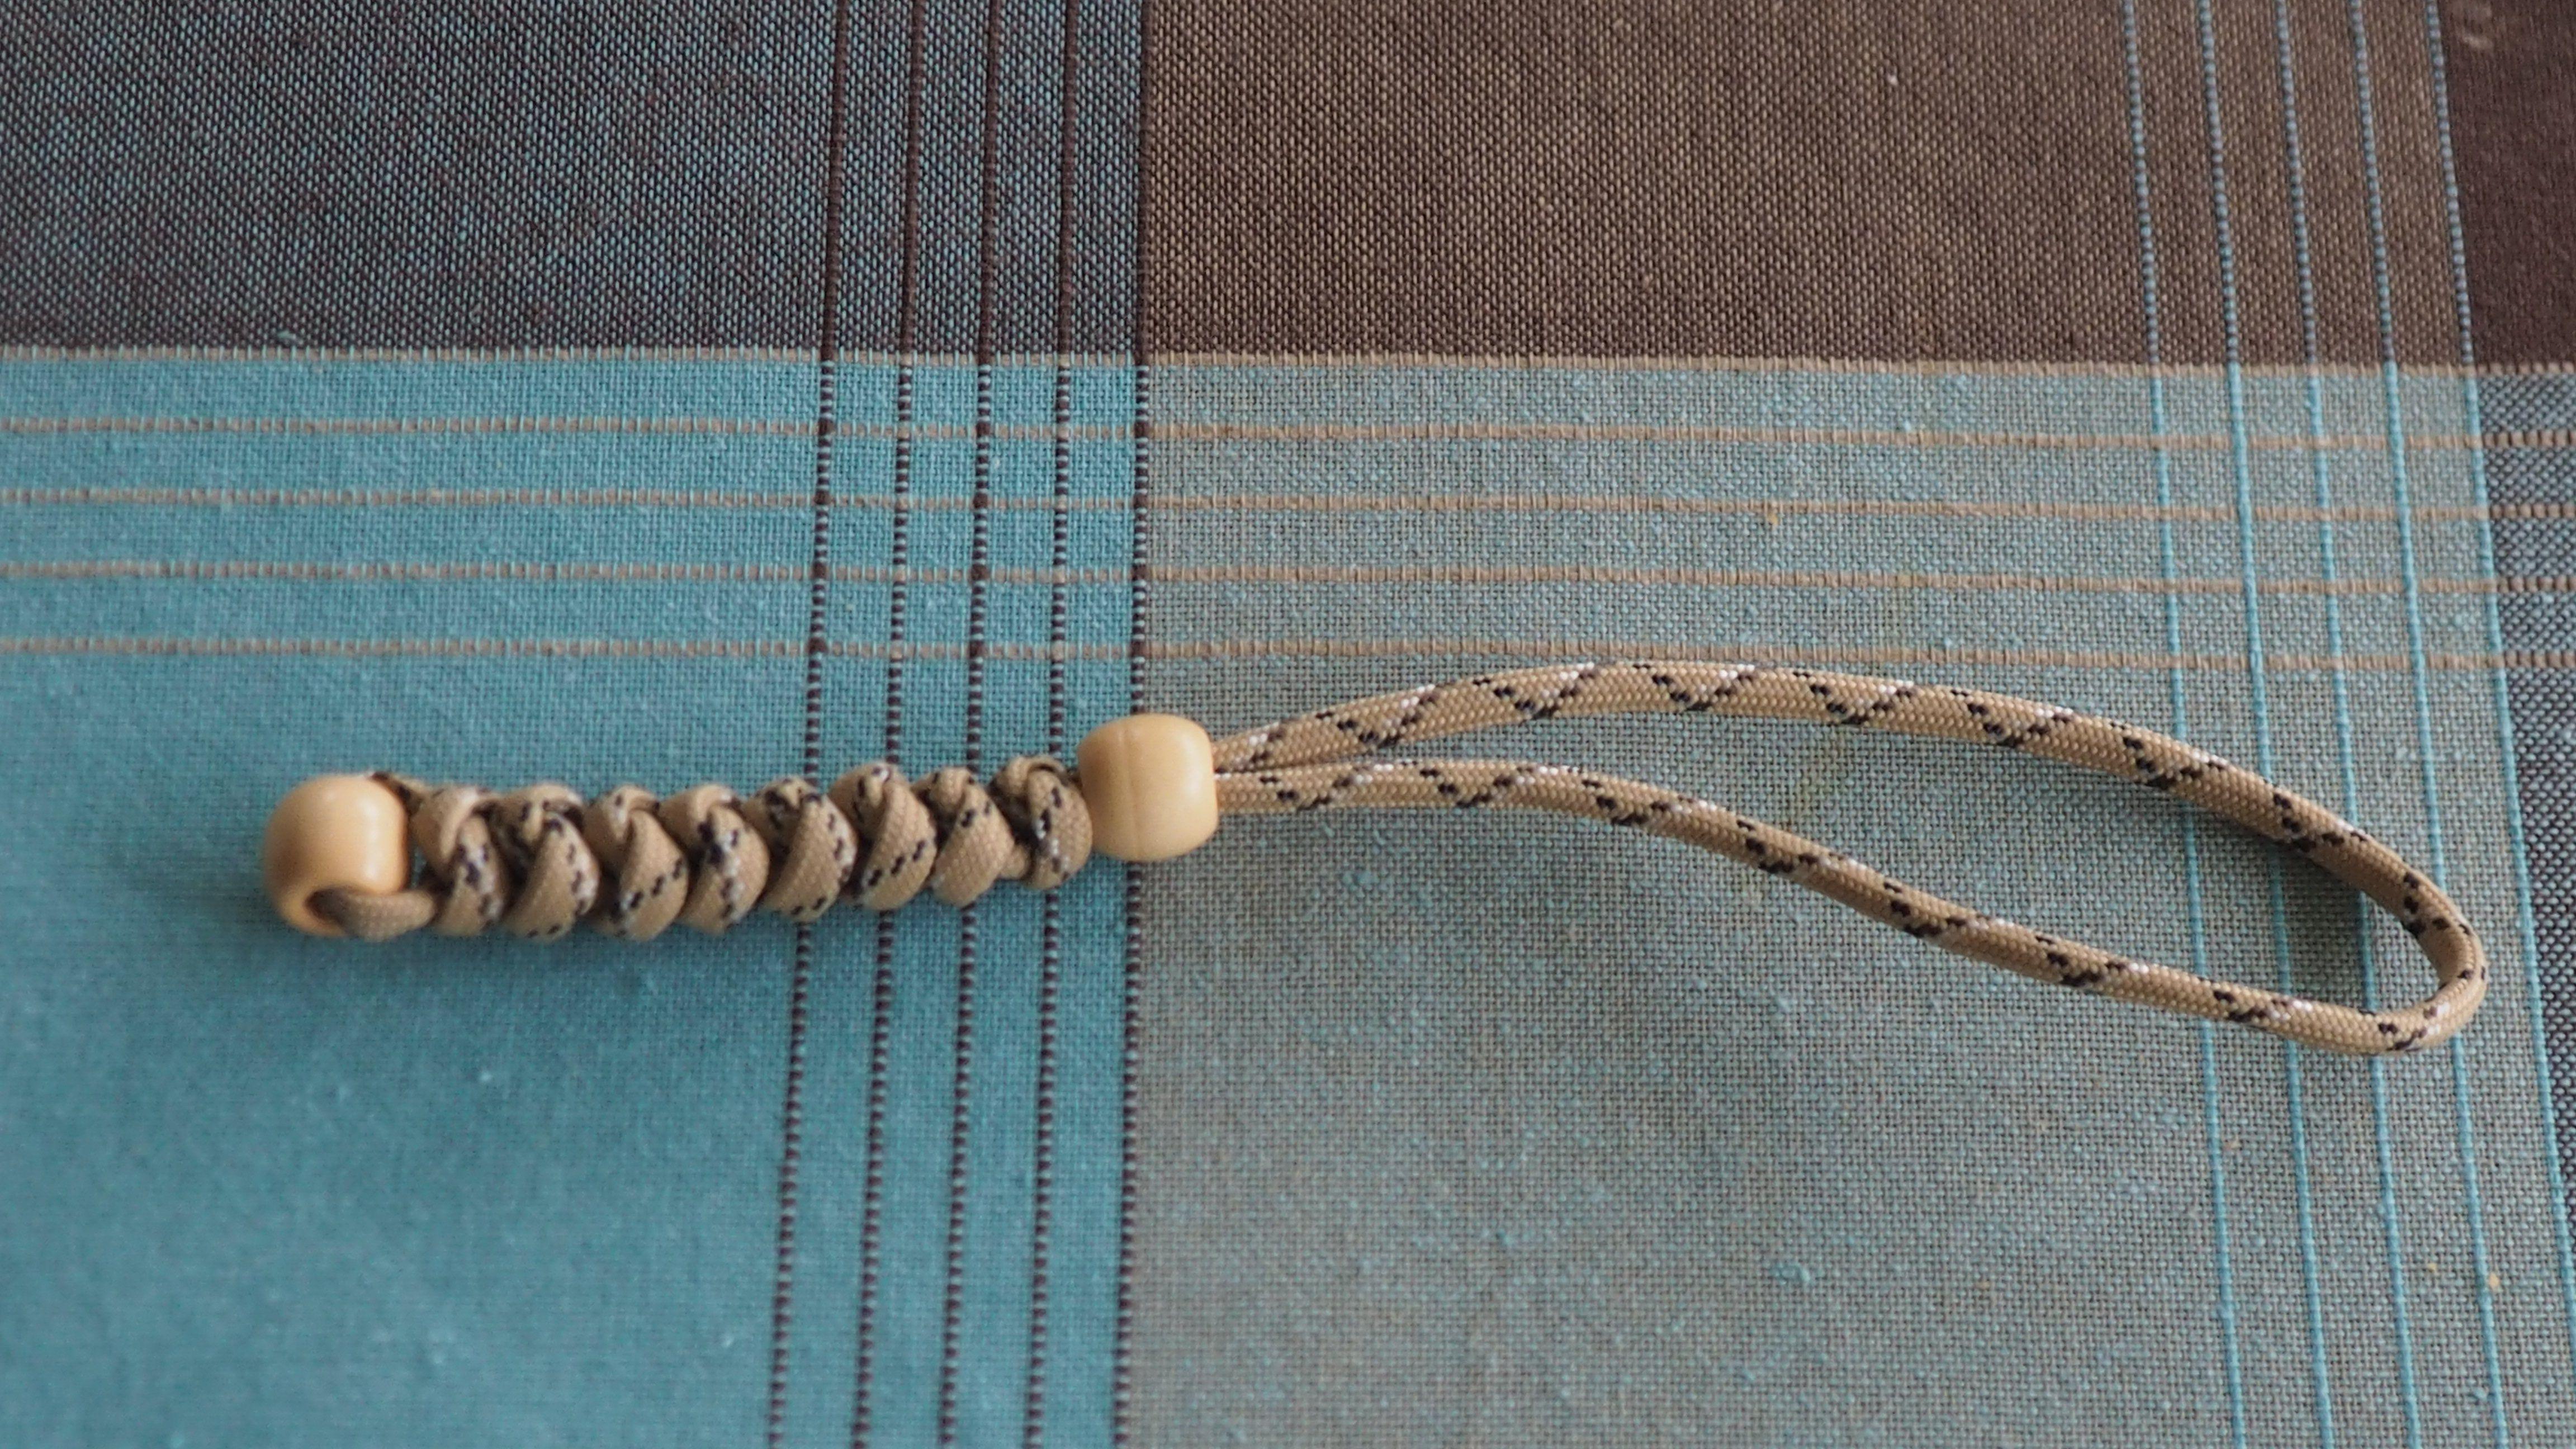 Tan Lanyard with beads